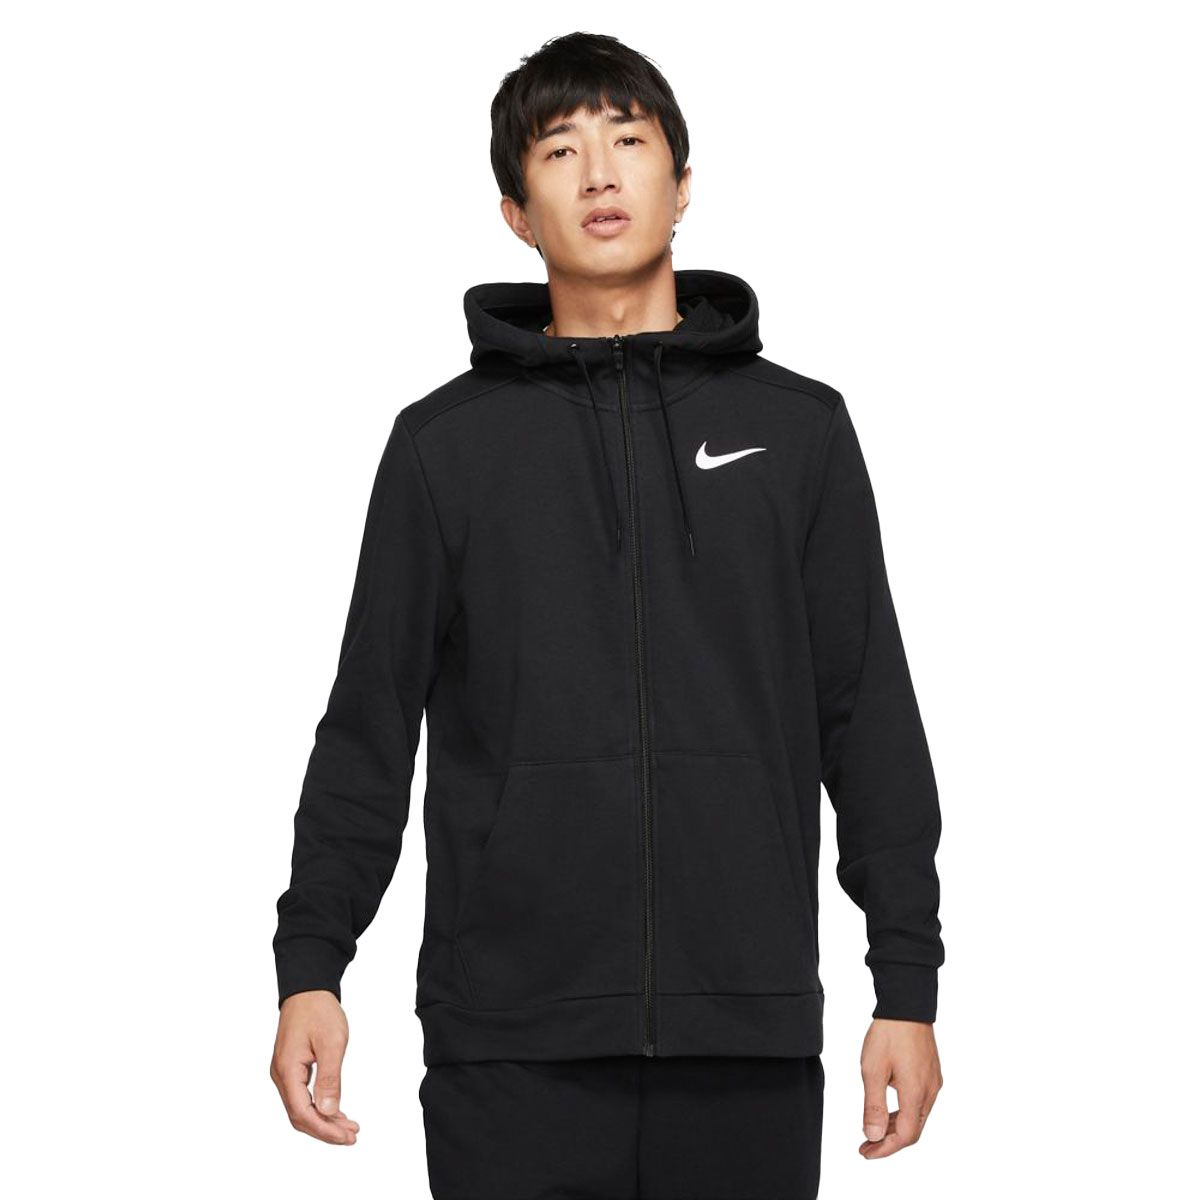 Nike Felpa Dri-FIT Uomo Nero